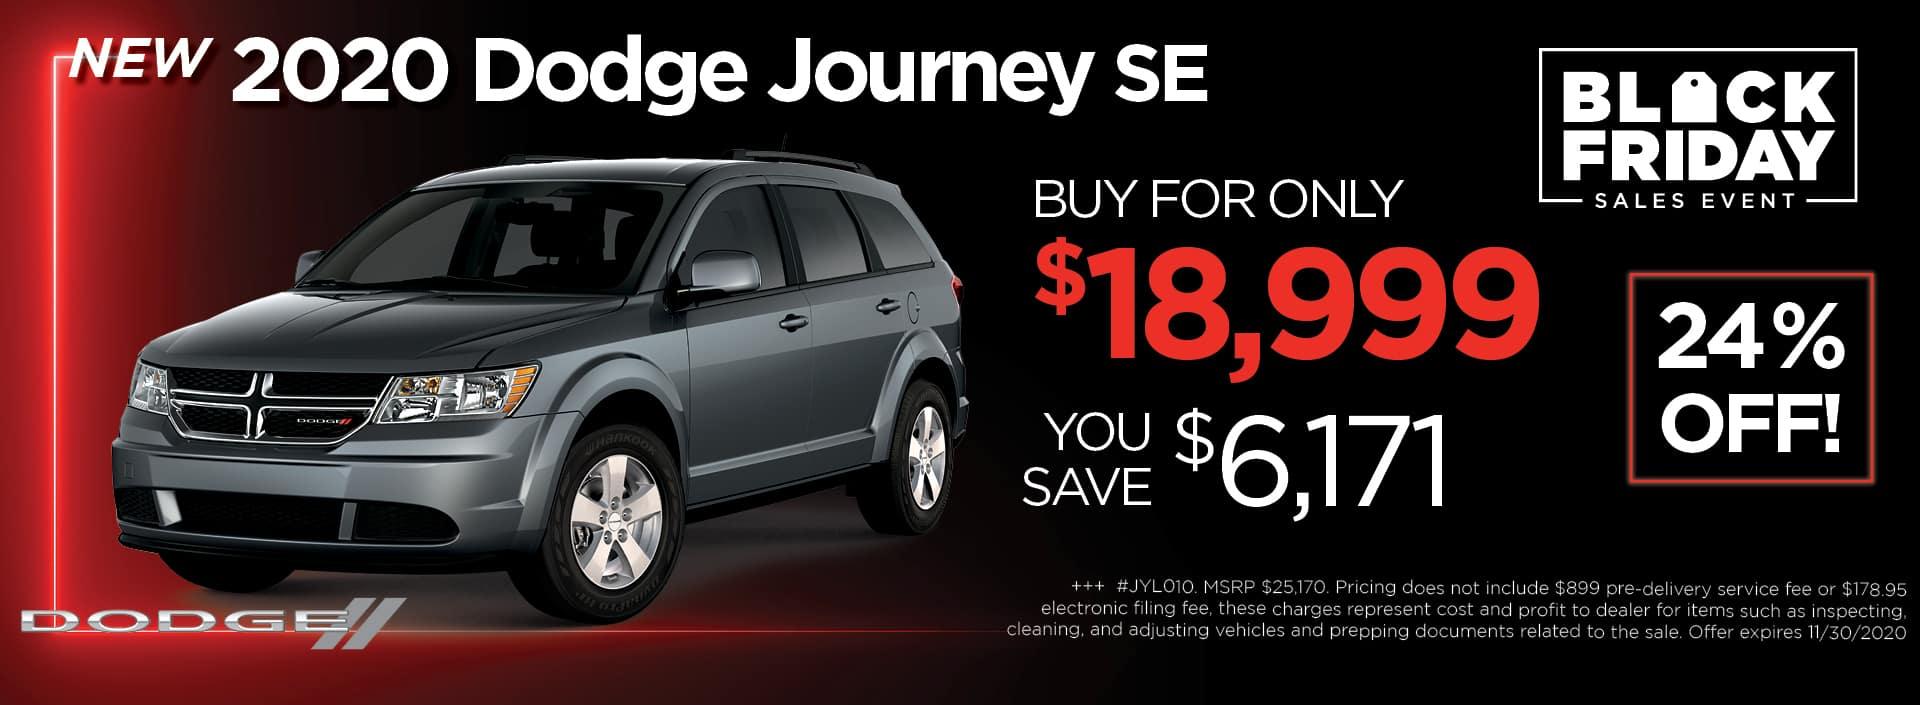 Dodge_Journey_BF